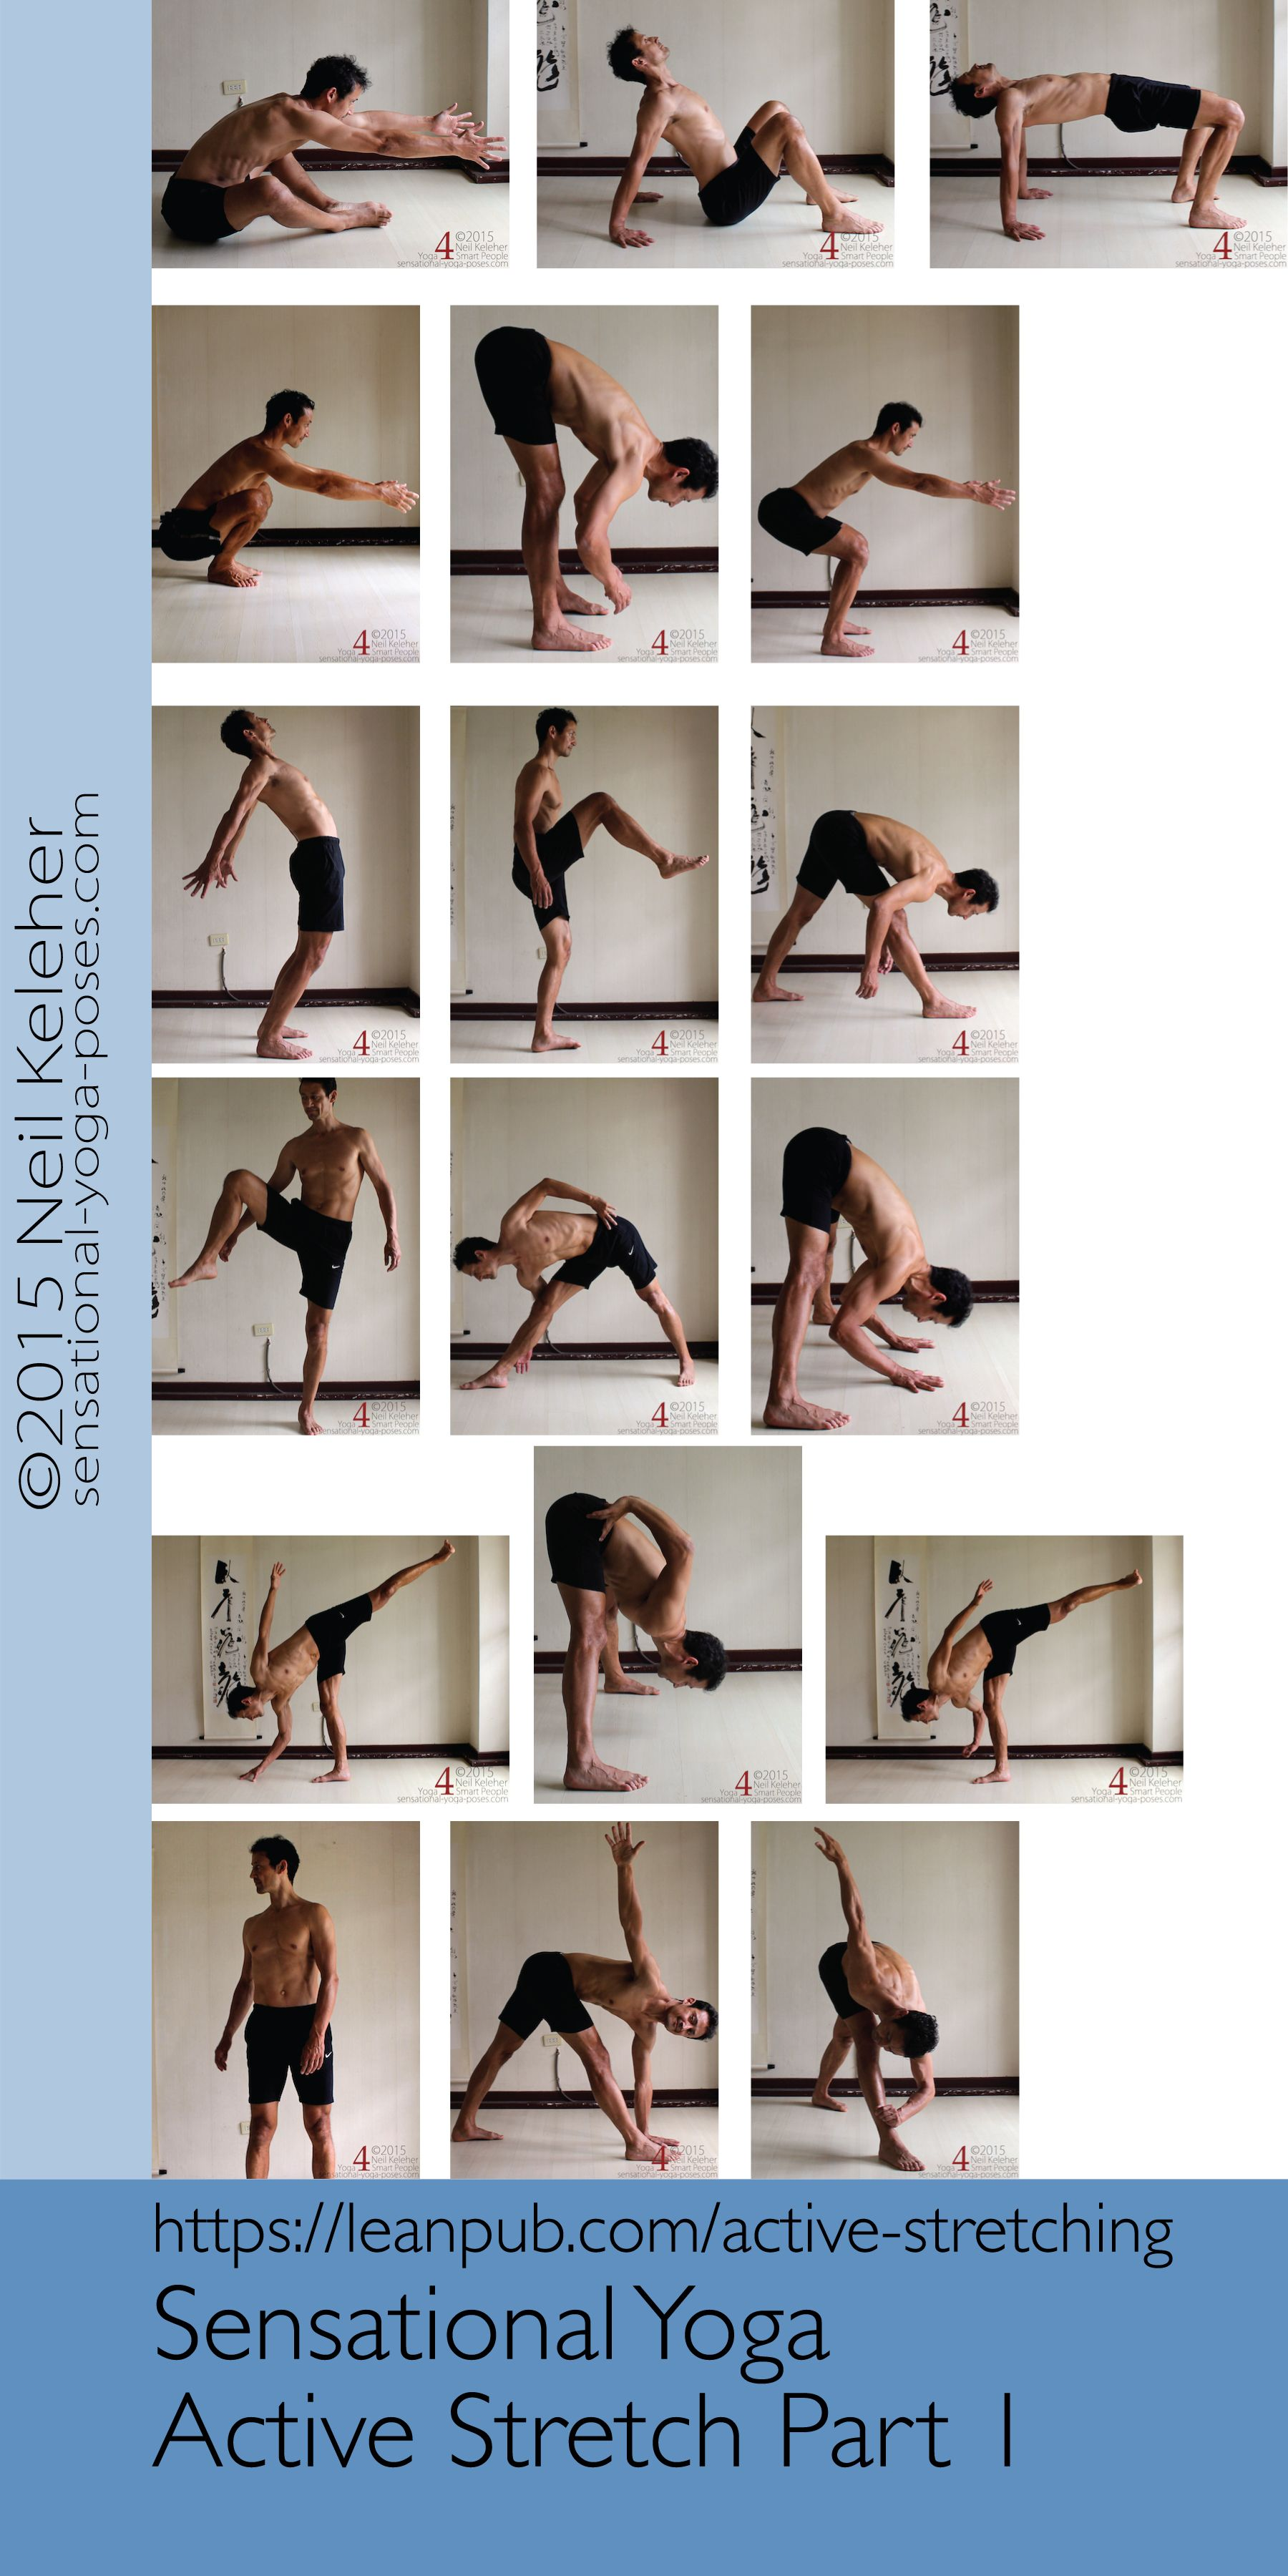 Bodybuilding Diet  Yoga postures, Yoga poses for men, Yoga sequences